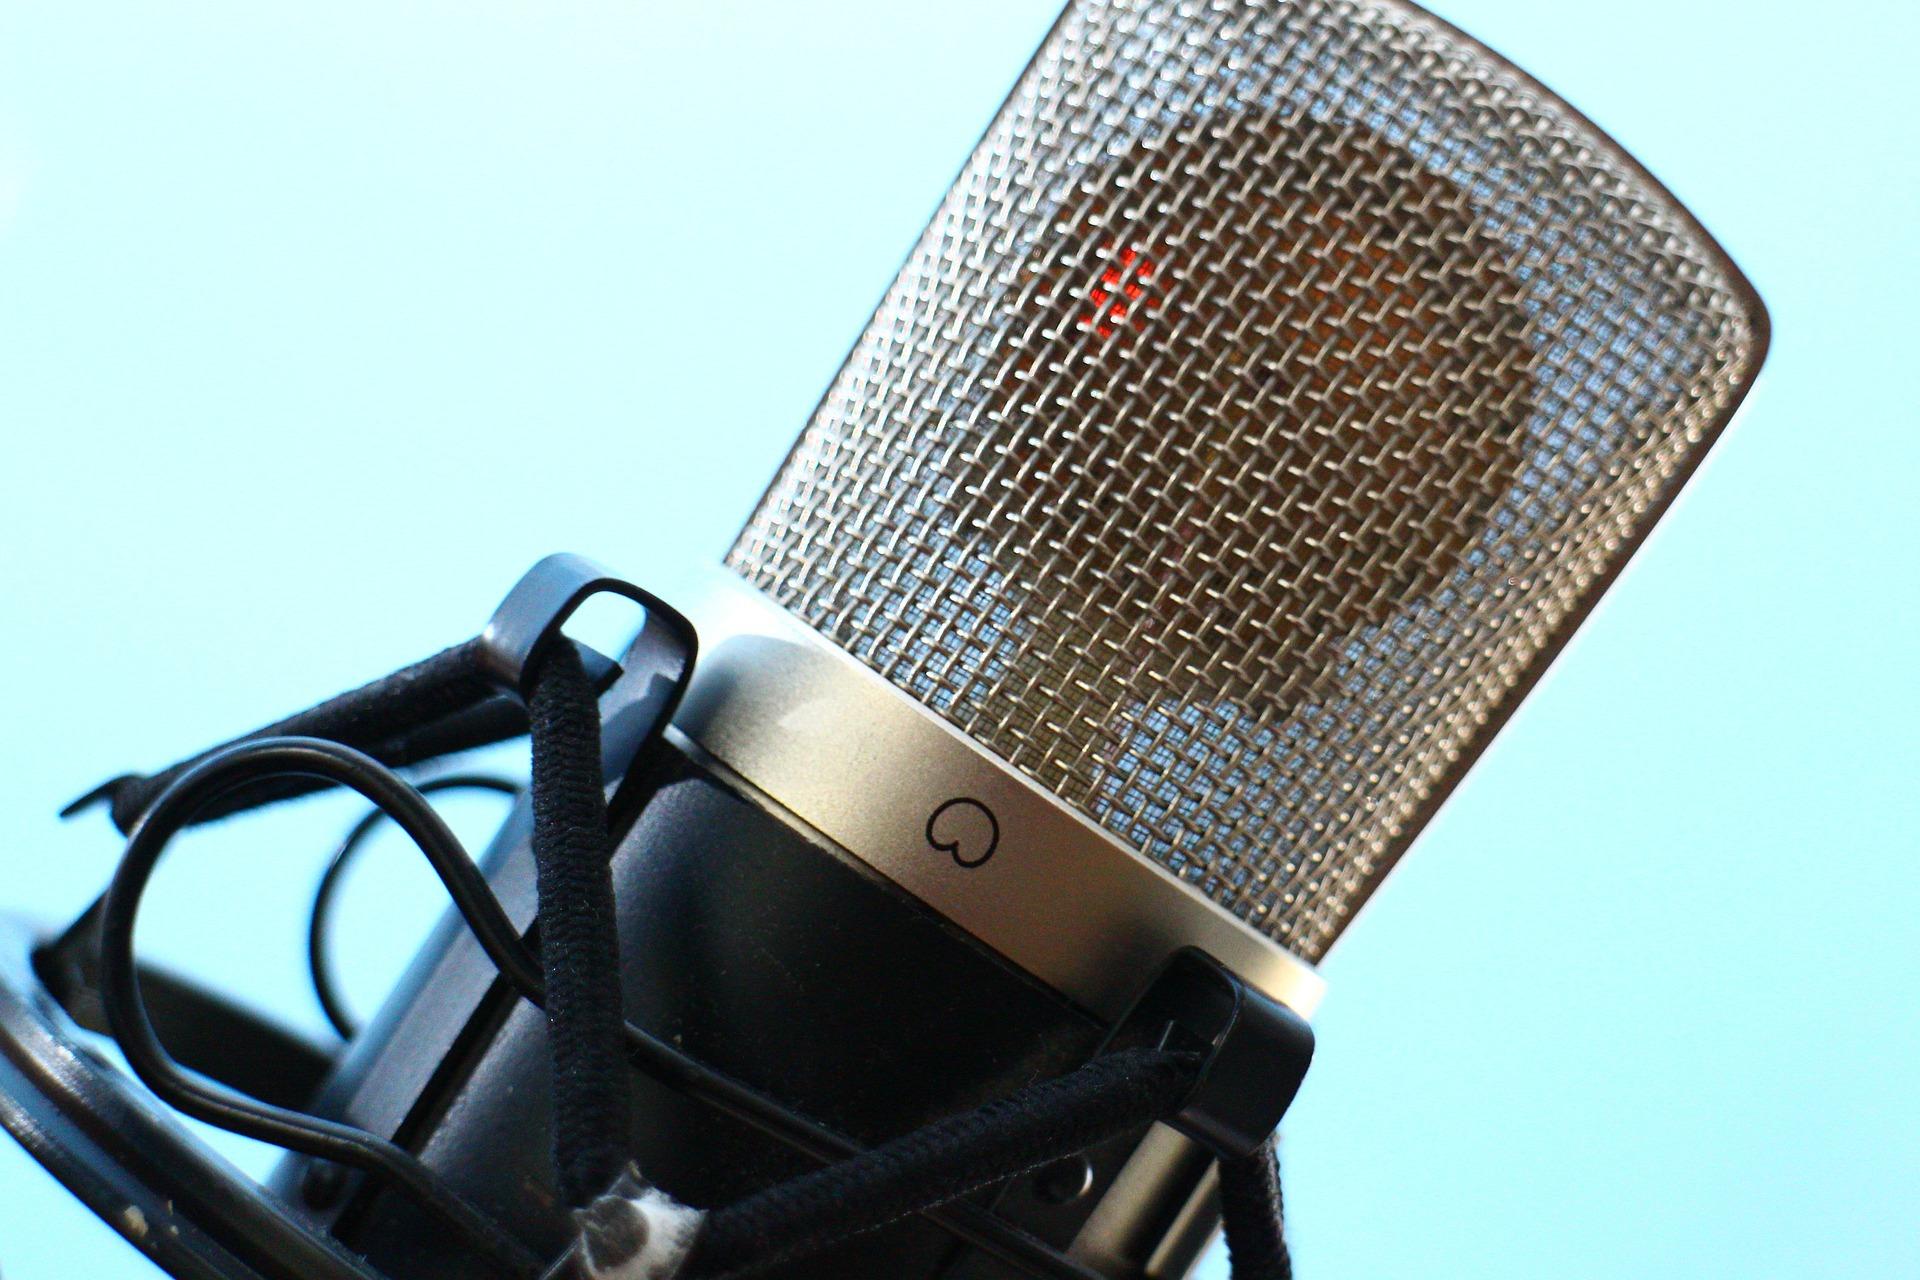 microphone-516043-1920.jpg